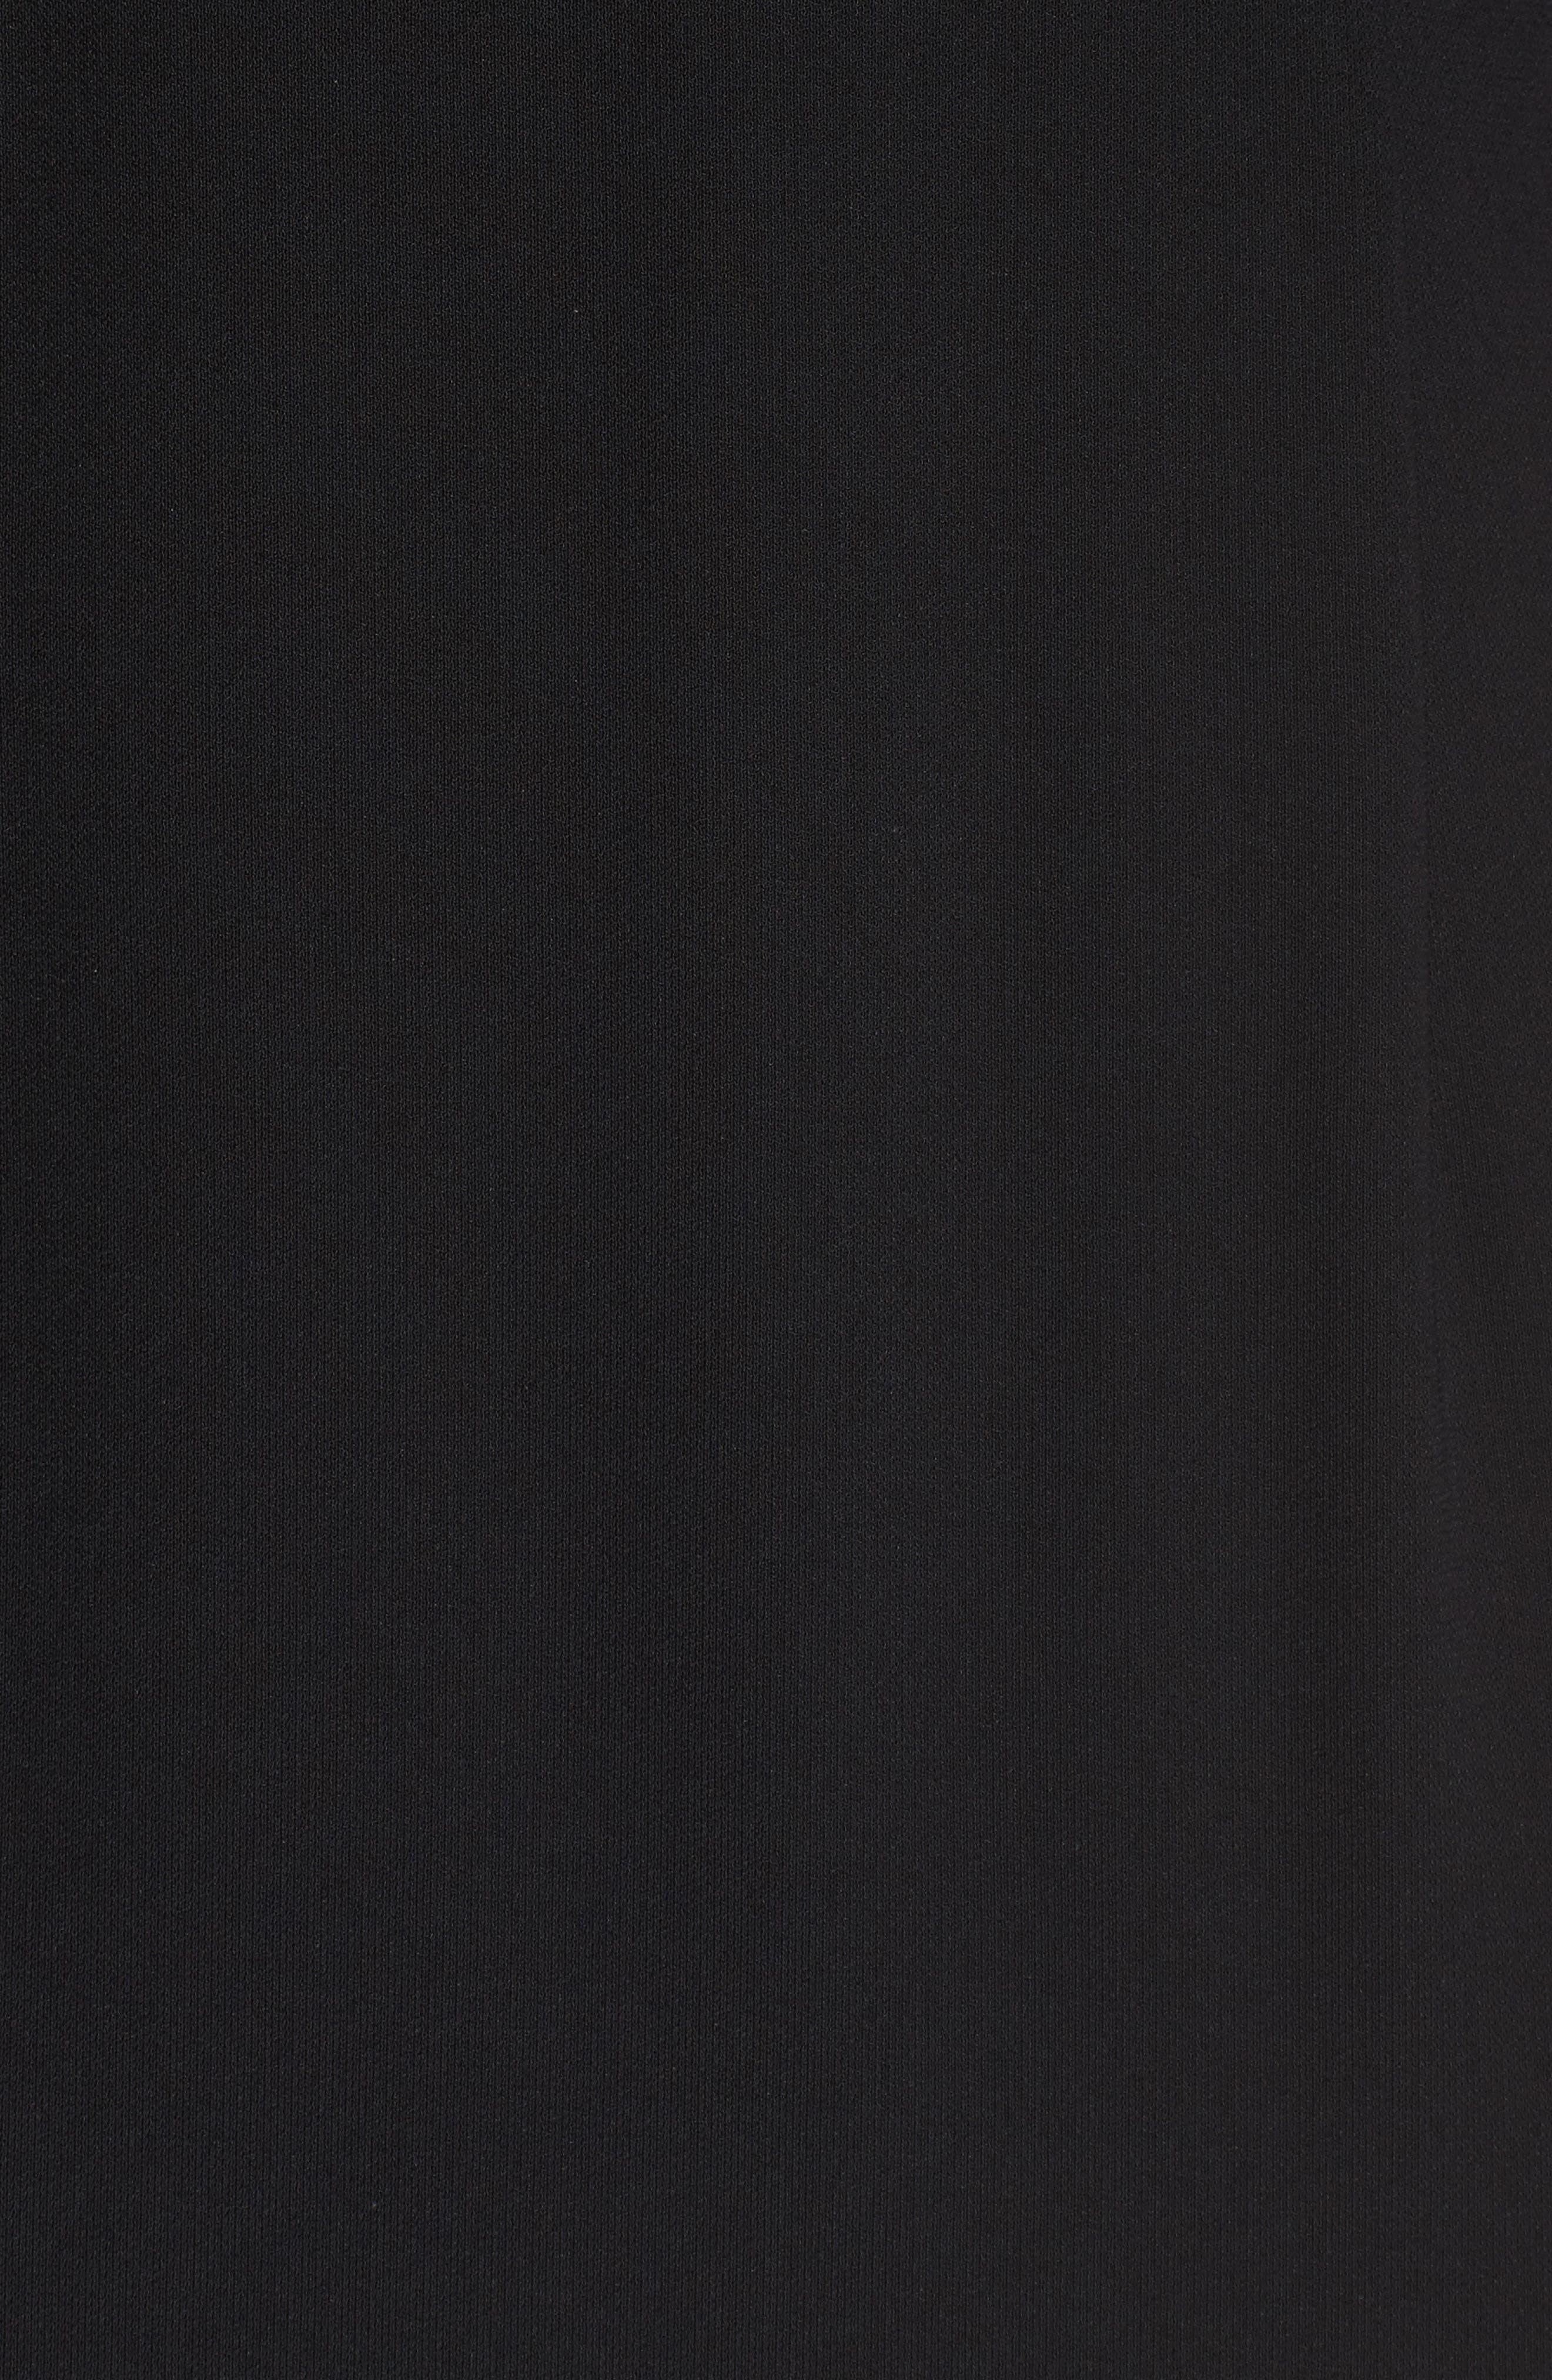 Drape Sleeve Cutout Sheath Dress,                             Alternate thumbnail 5, color,